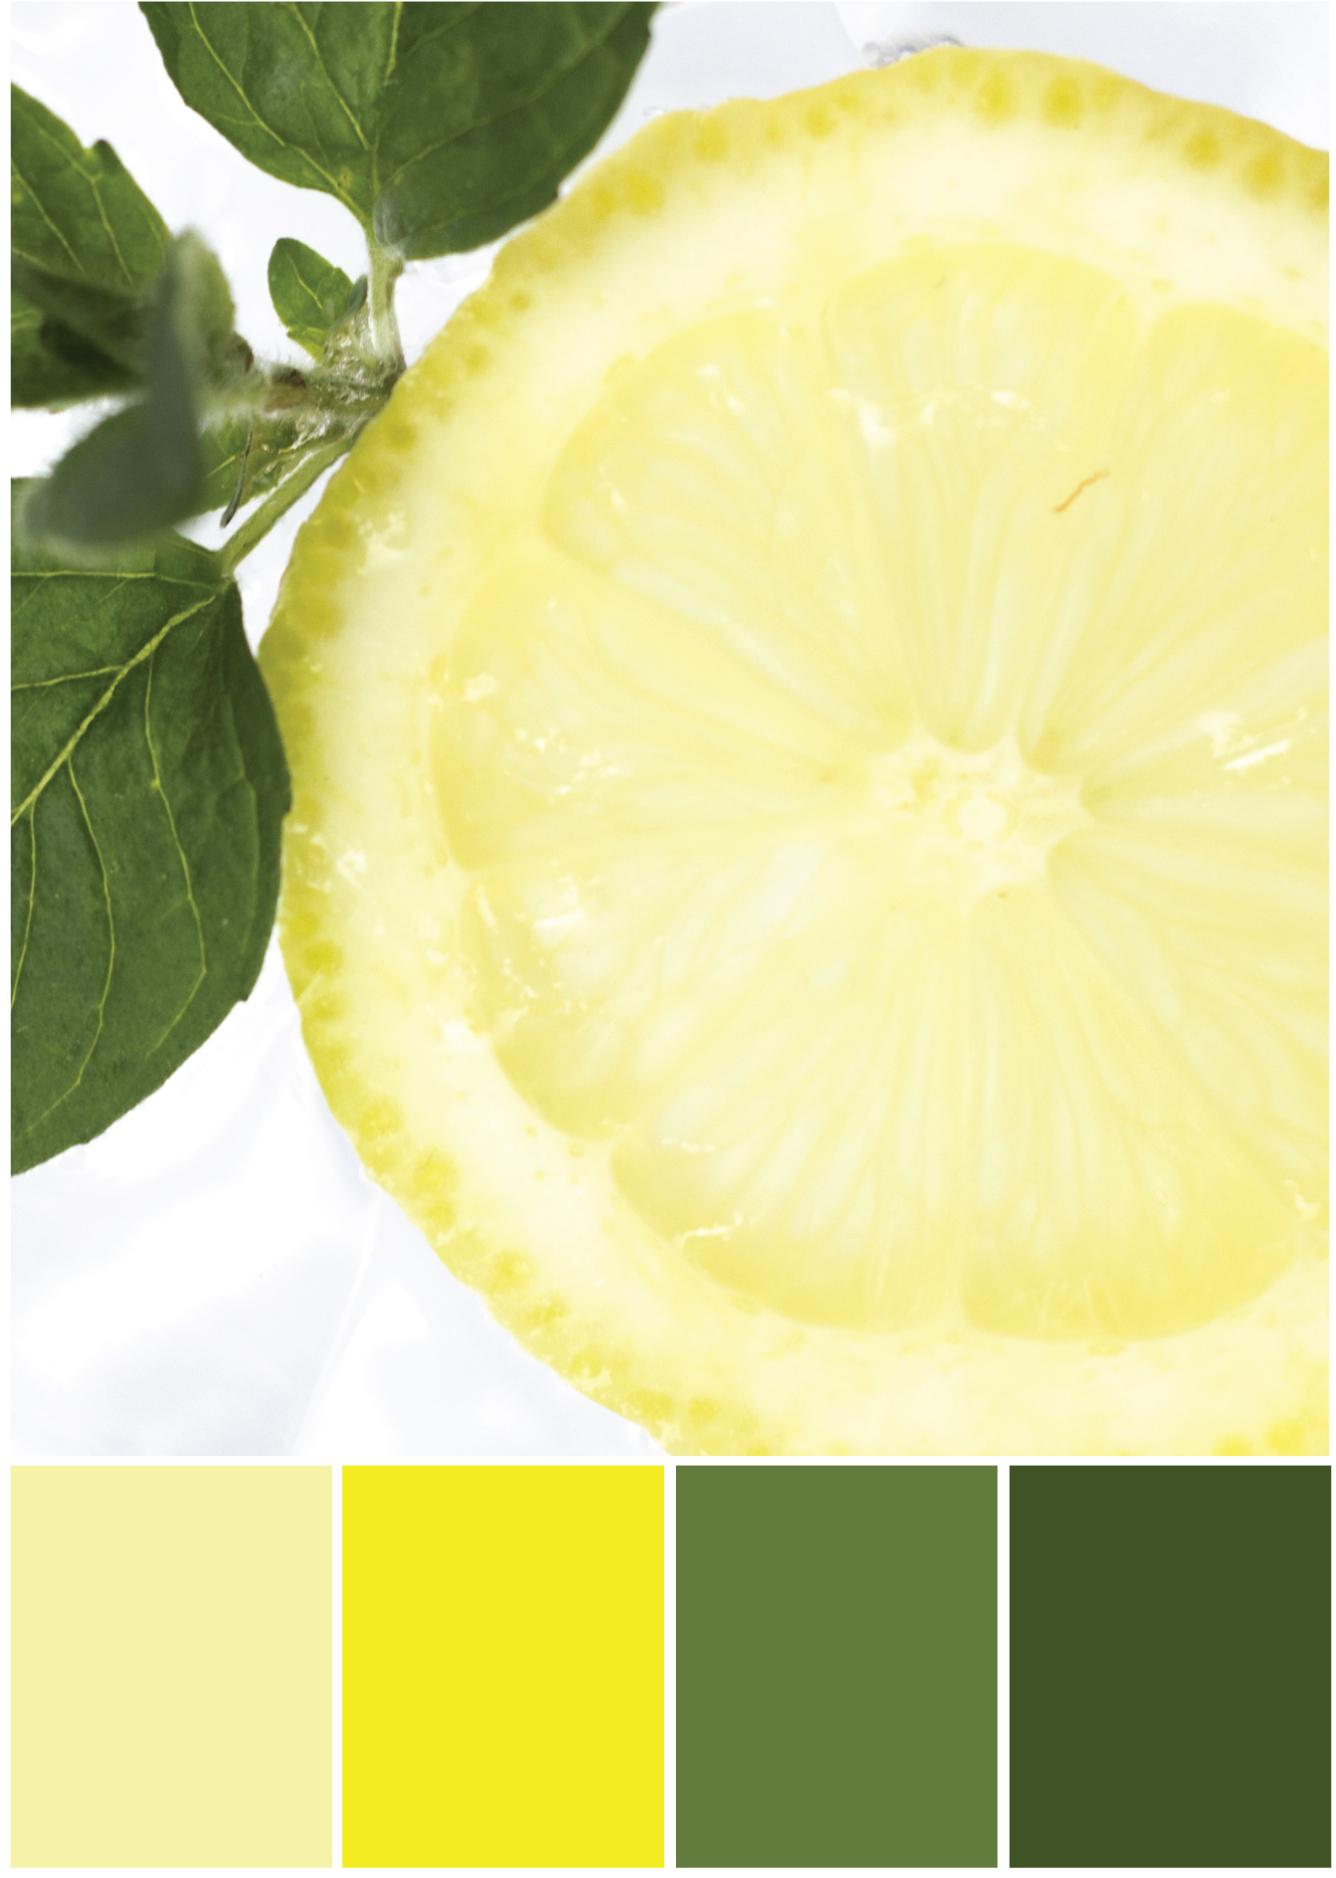 Gelb - Grüne Farbpalette - Tweed & Greet